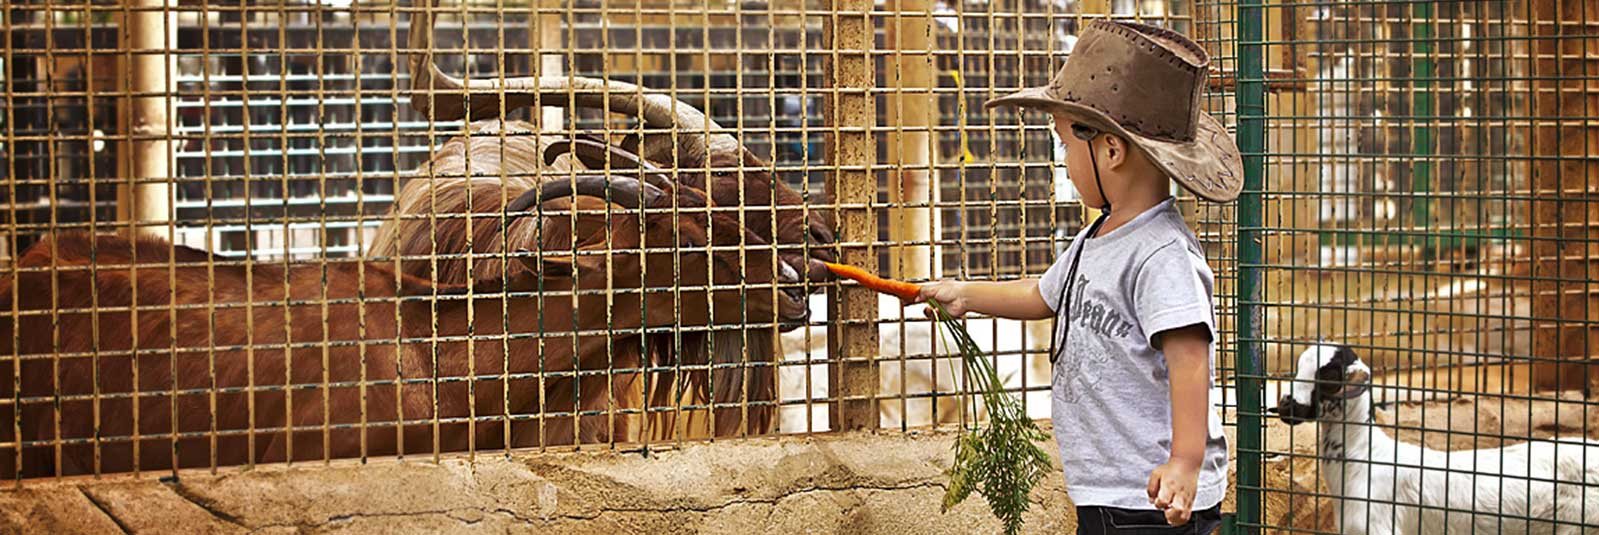 Abu-Dhabi-Emirates-Zoo.jpg